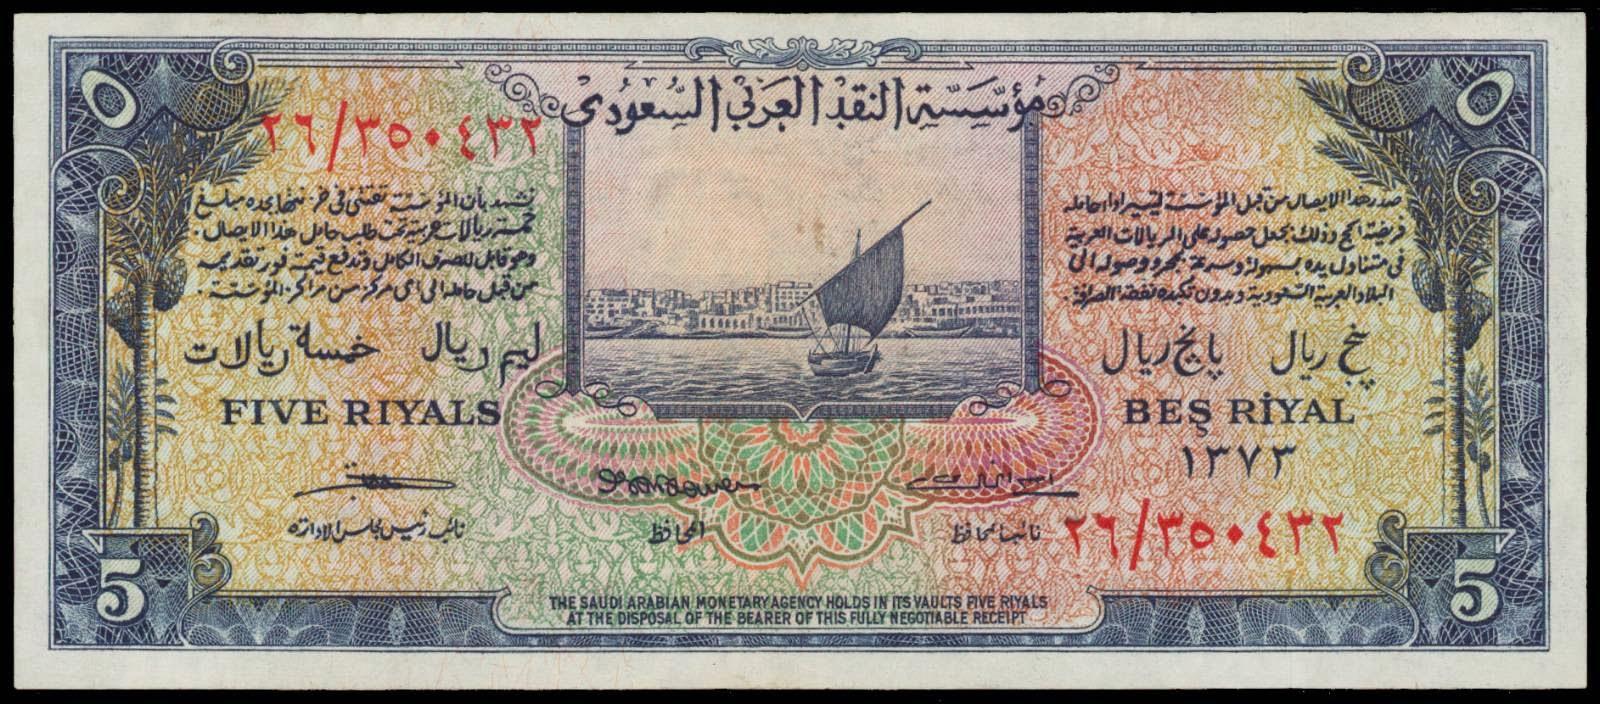 Saudi Arabia banknotes 5 Riyals Note Pilgrim Receipts